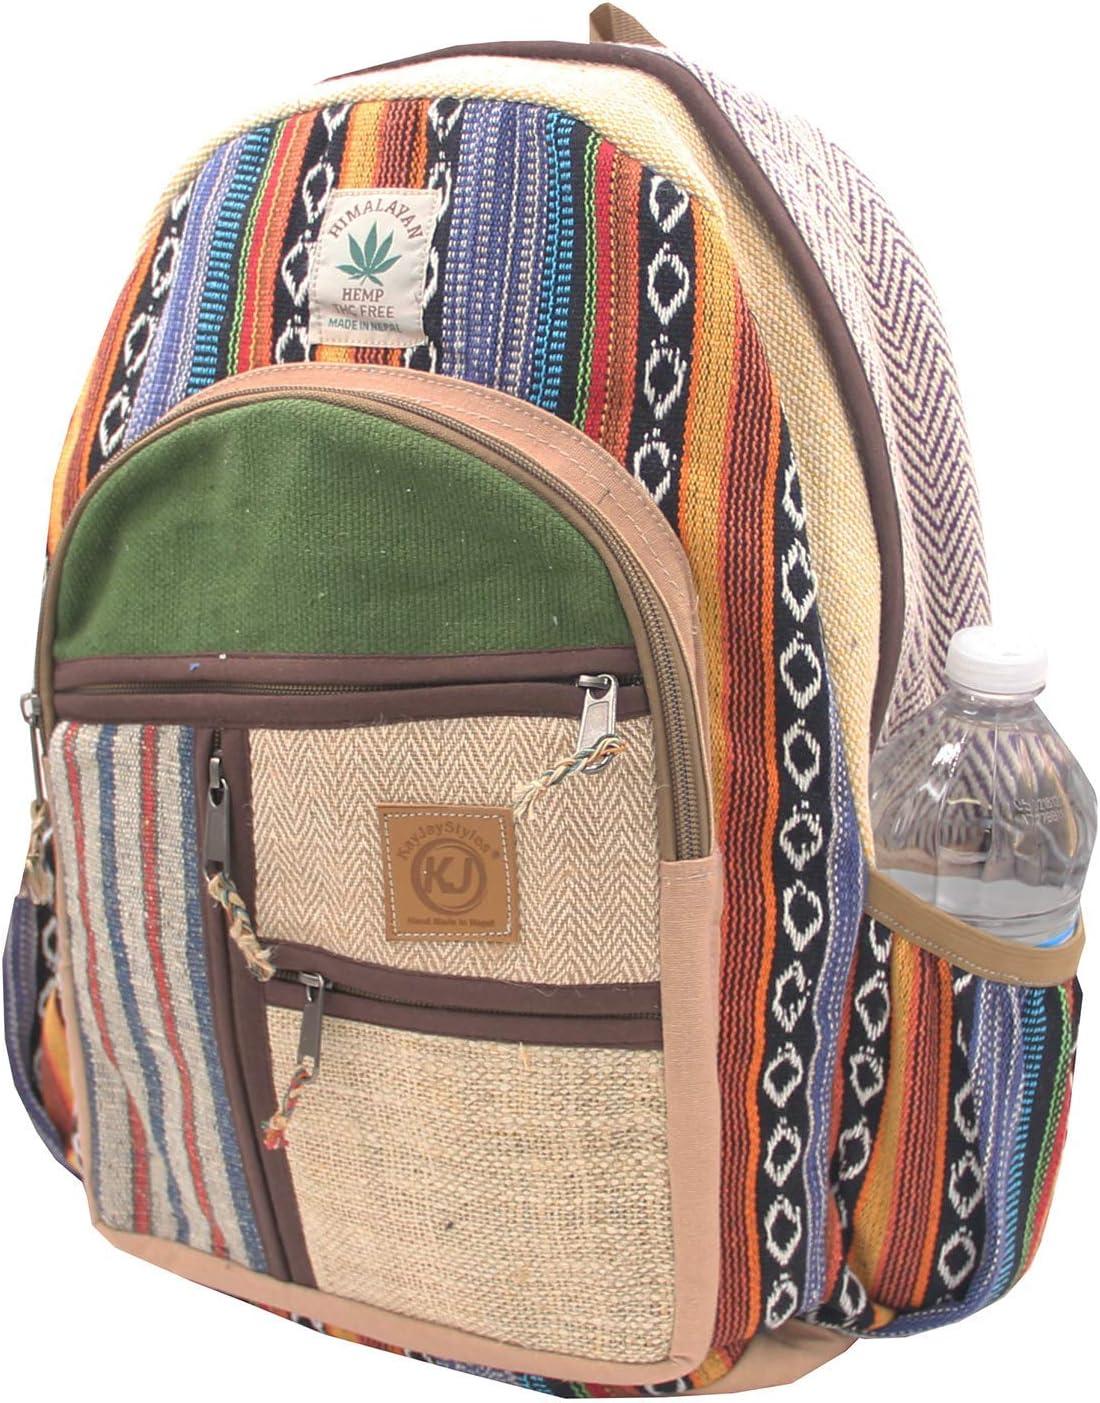 KayJayStyles Natural Handmade Large Multi Pocket Hemp Nepal Backpack (BKPK-6)